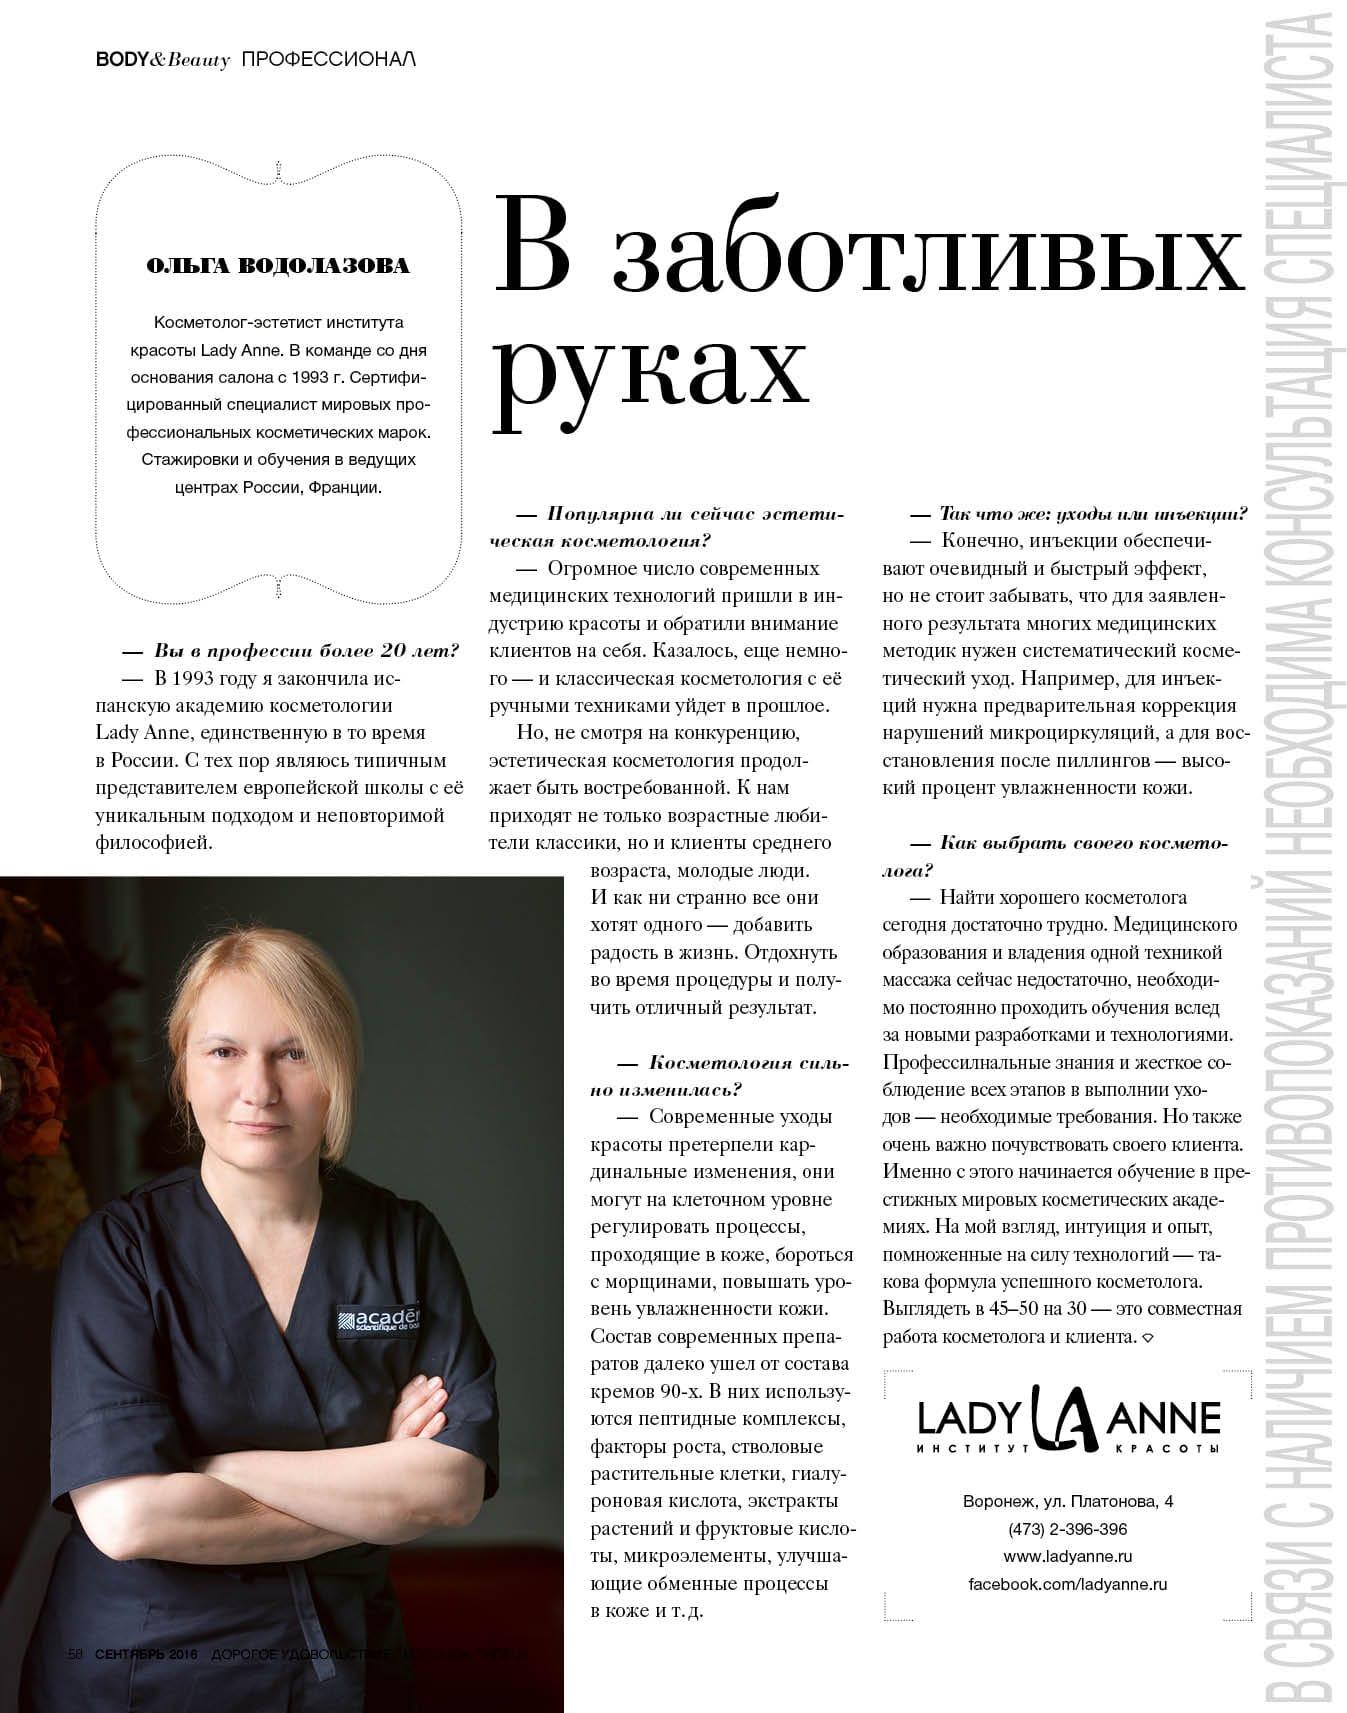 ДУ Лена Анна сентябрь 2016_Водолазова